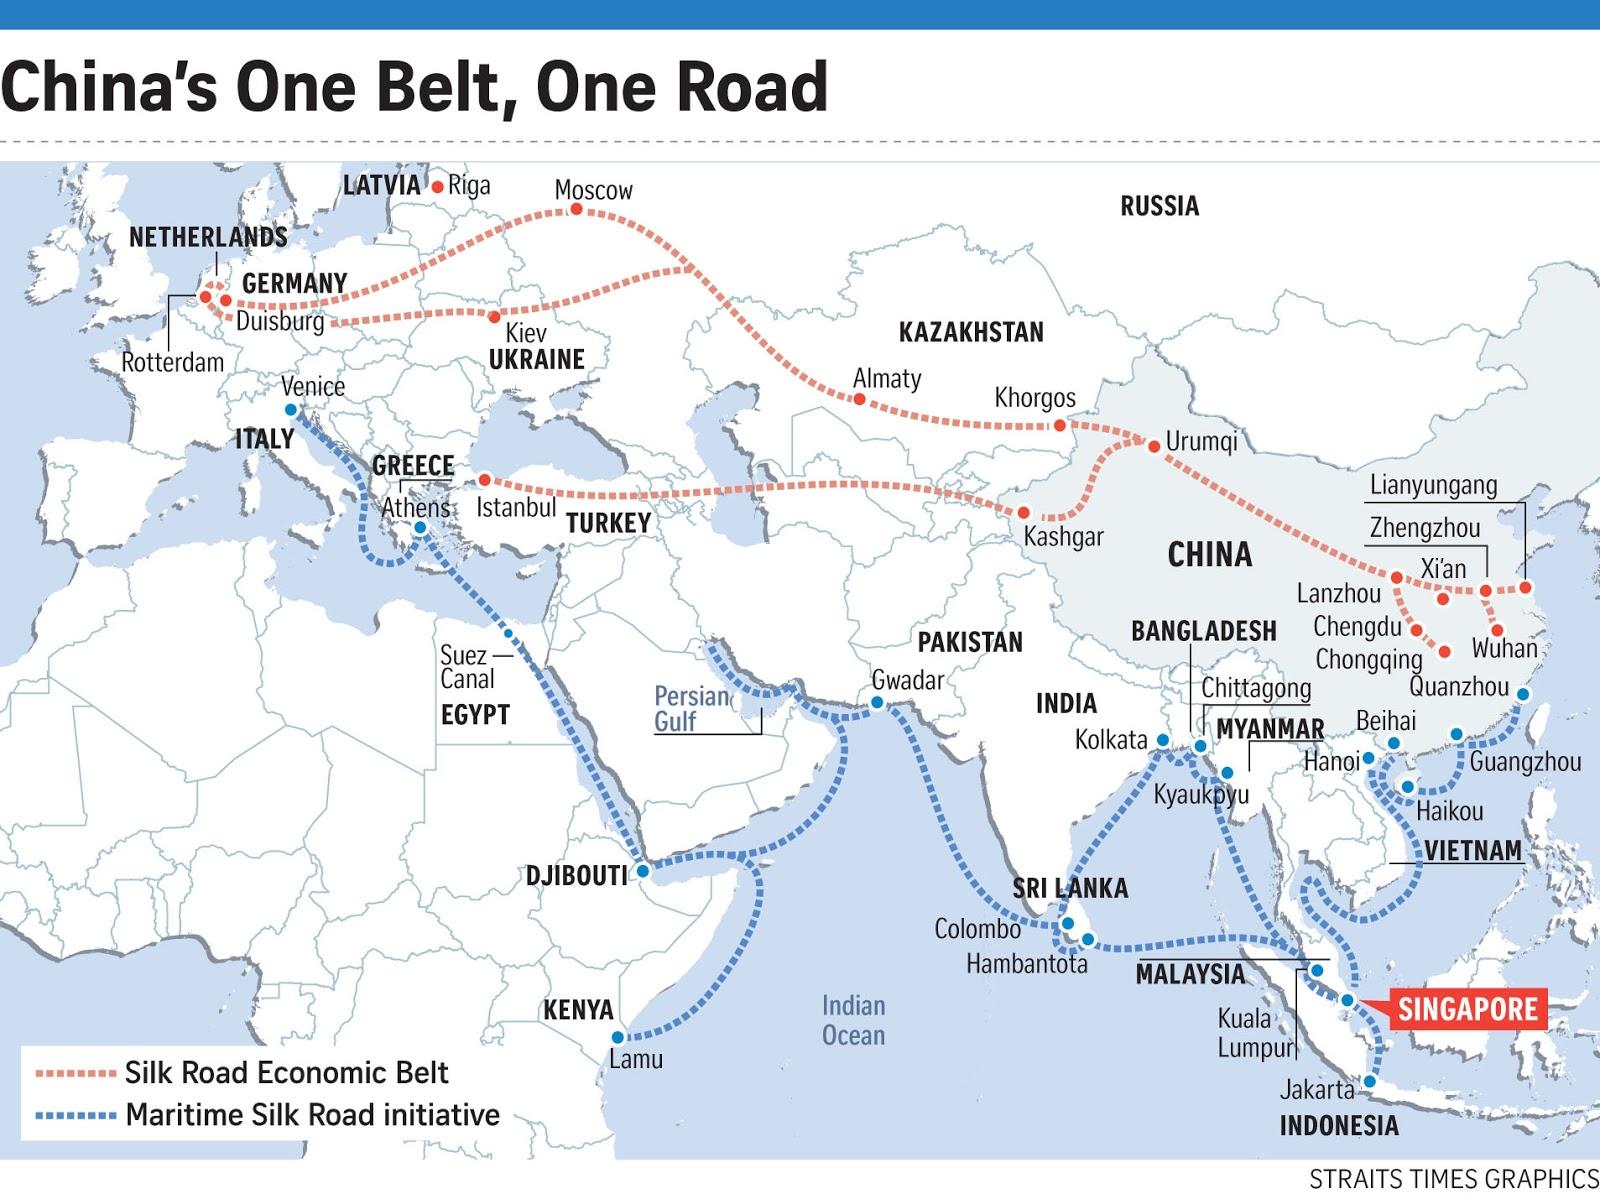 China-One-Belt-One-Road-ST-photo